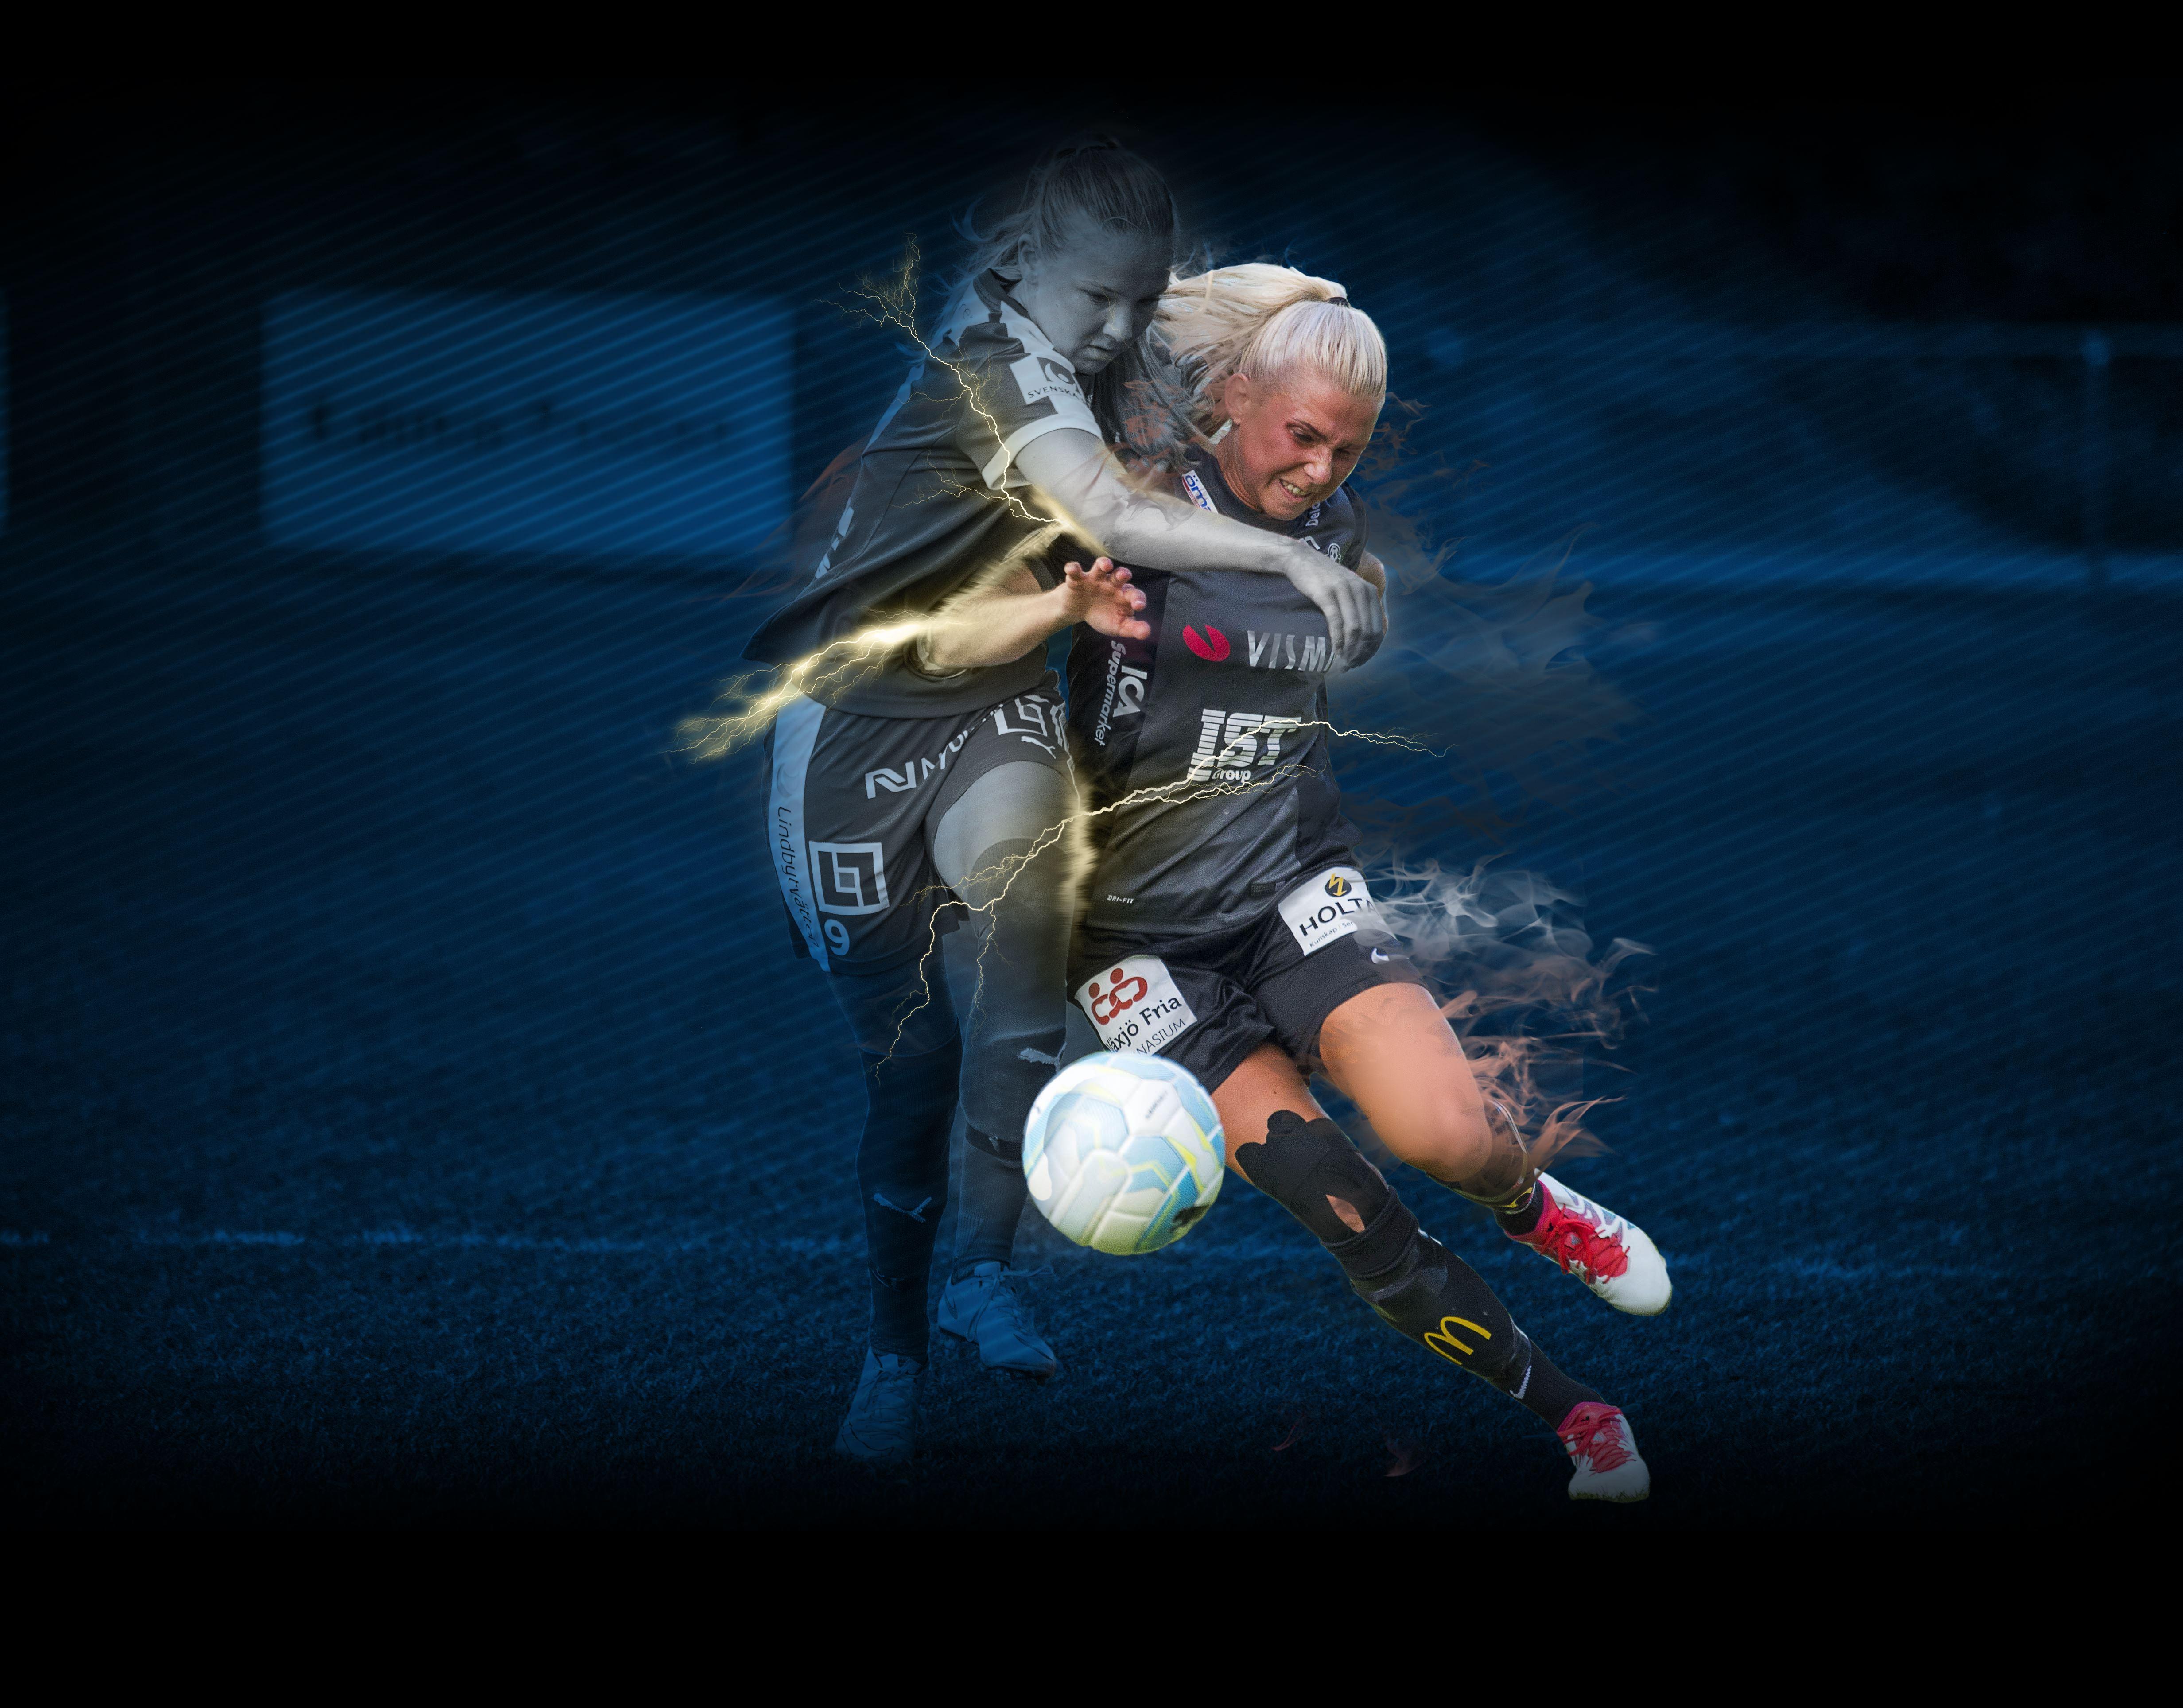 Fotboll: Växjö DFF -Mallbackens IF Sunne